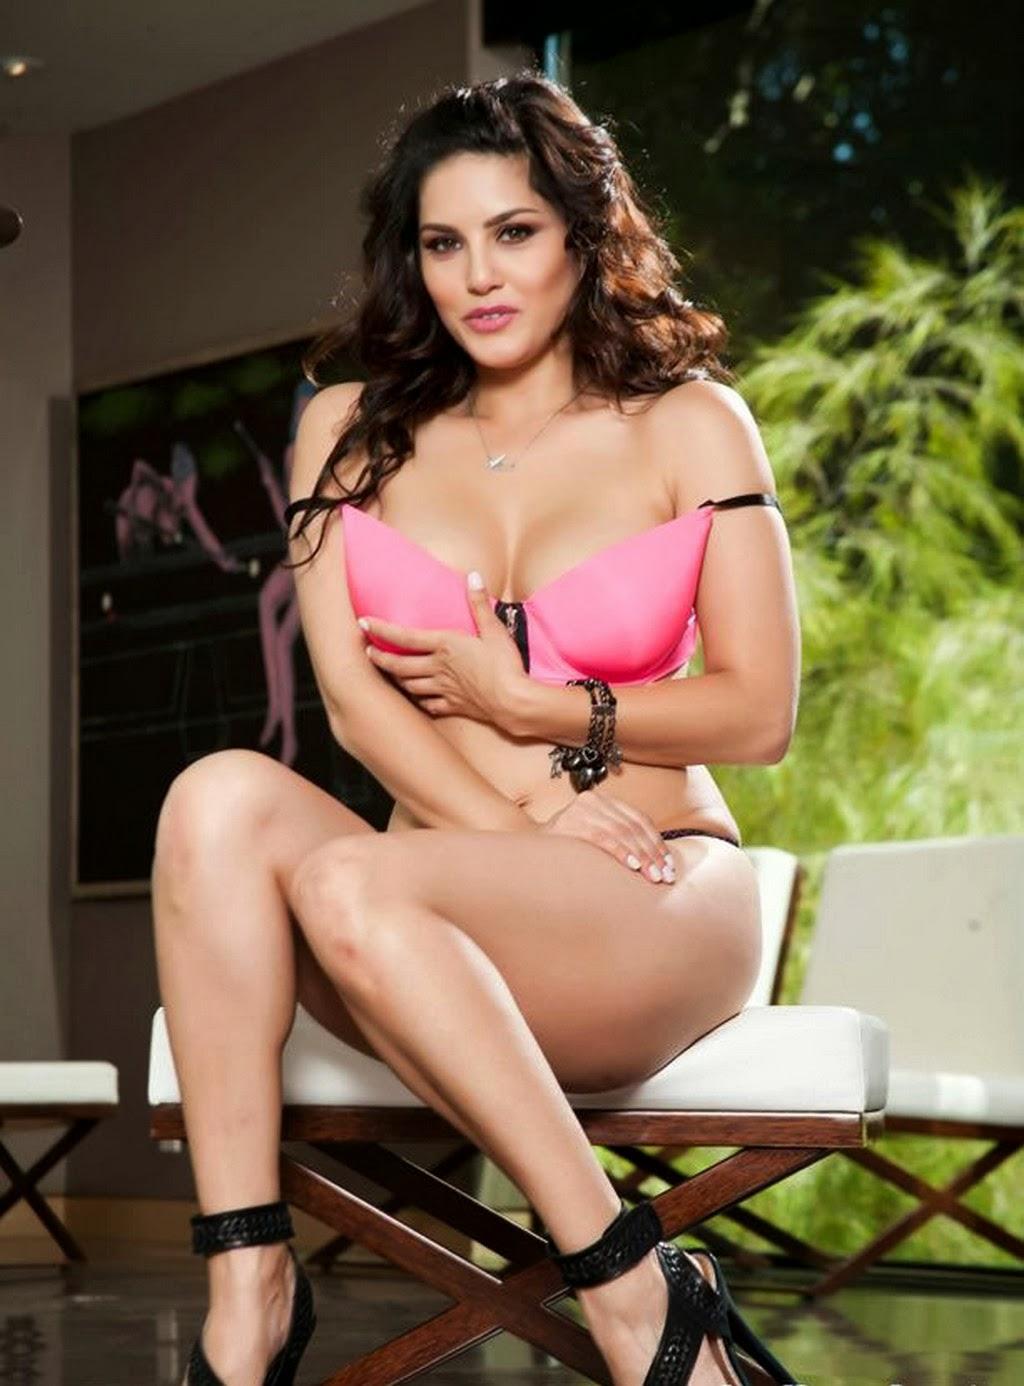 hot Sunny Leone pink bra Wallpapers hd nice image